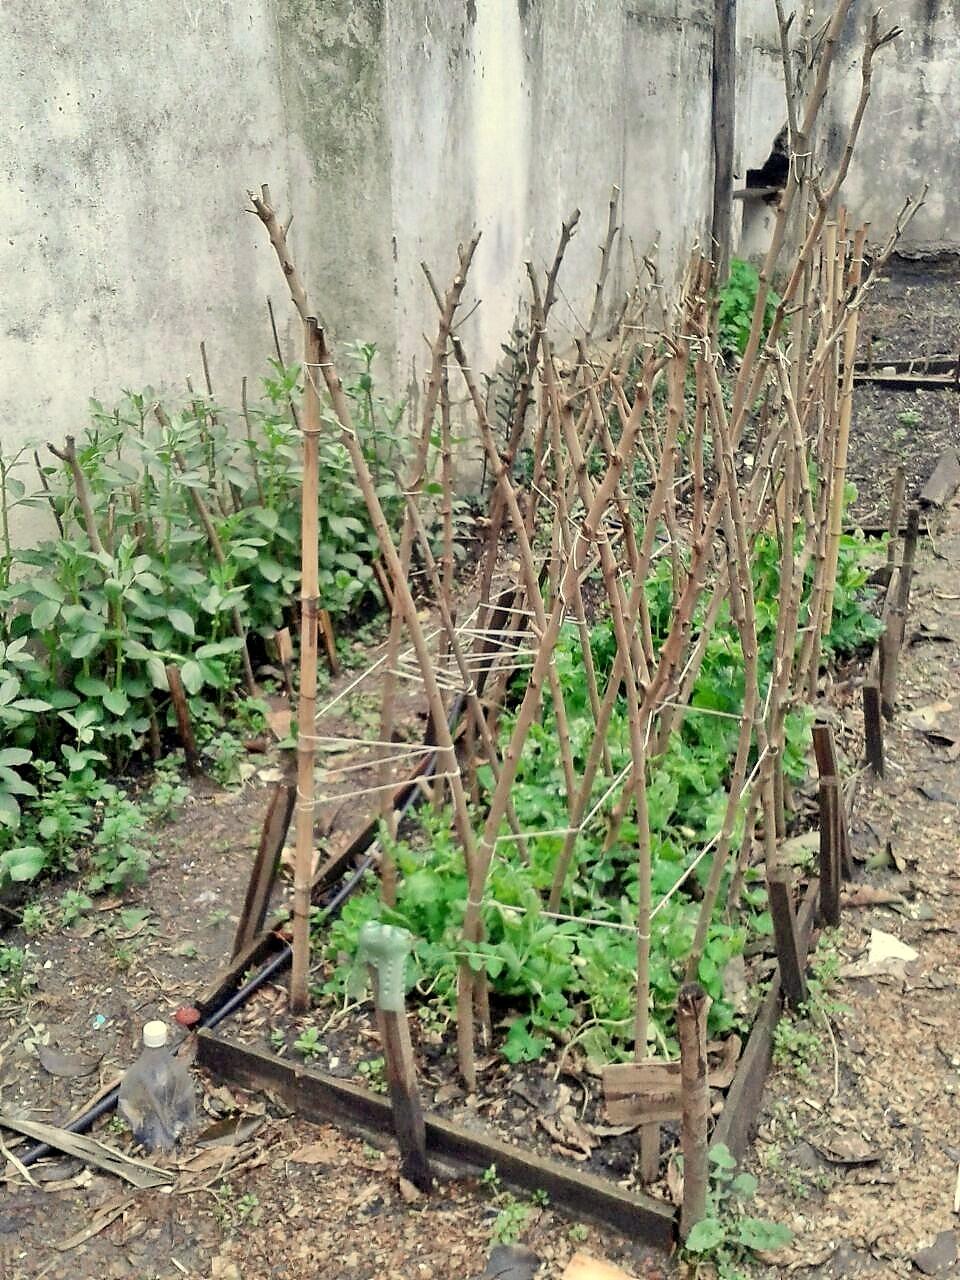 Horticultura org nica wikipedia la enciclopedia libre for Plantas para huerta organica